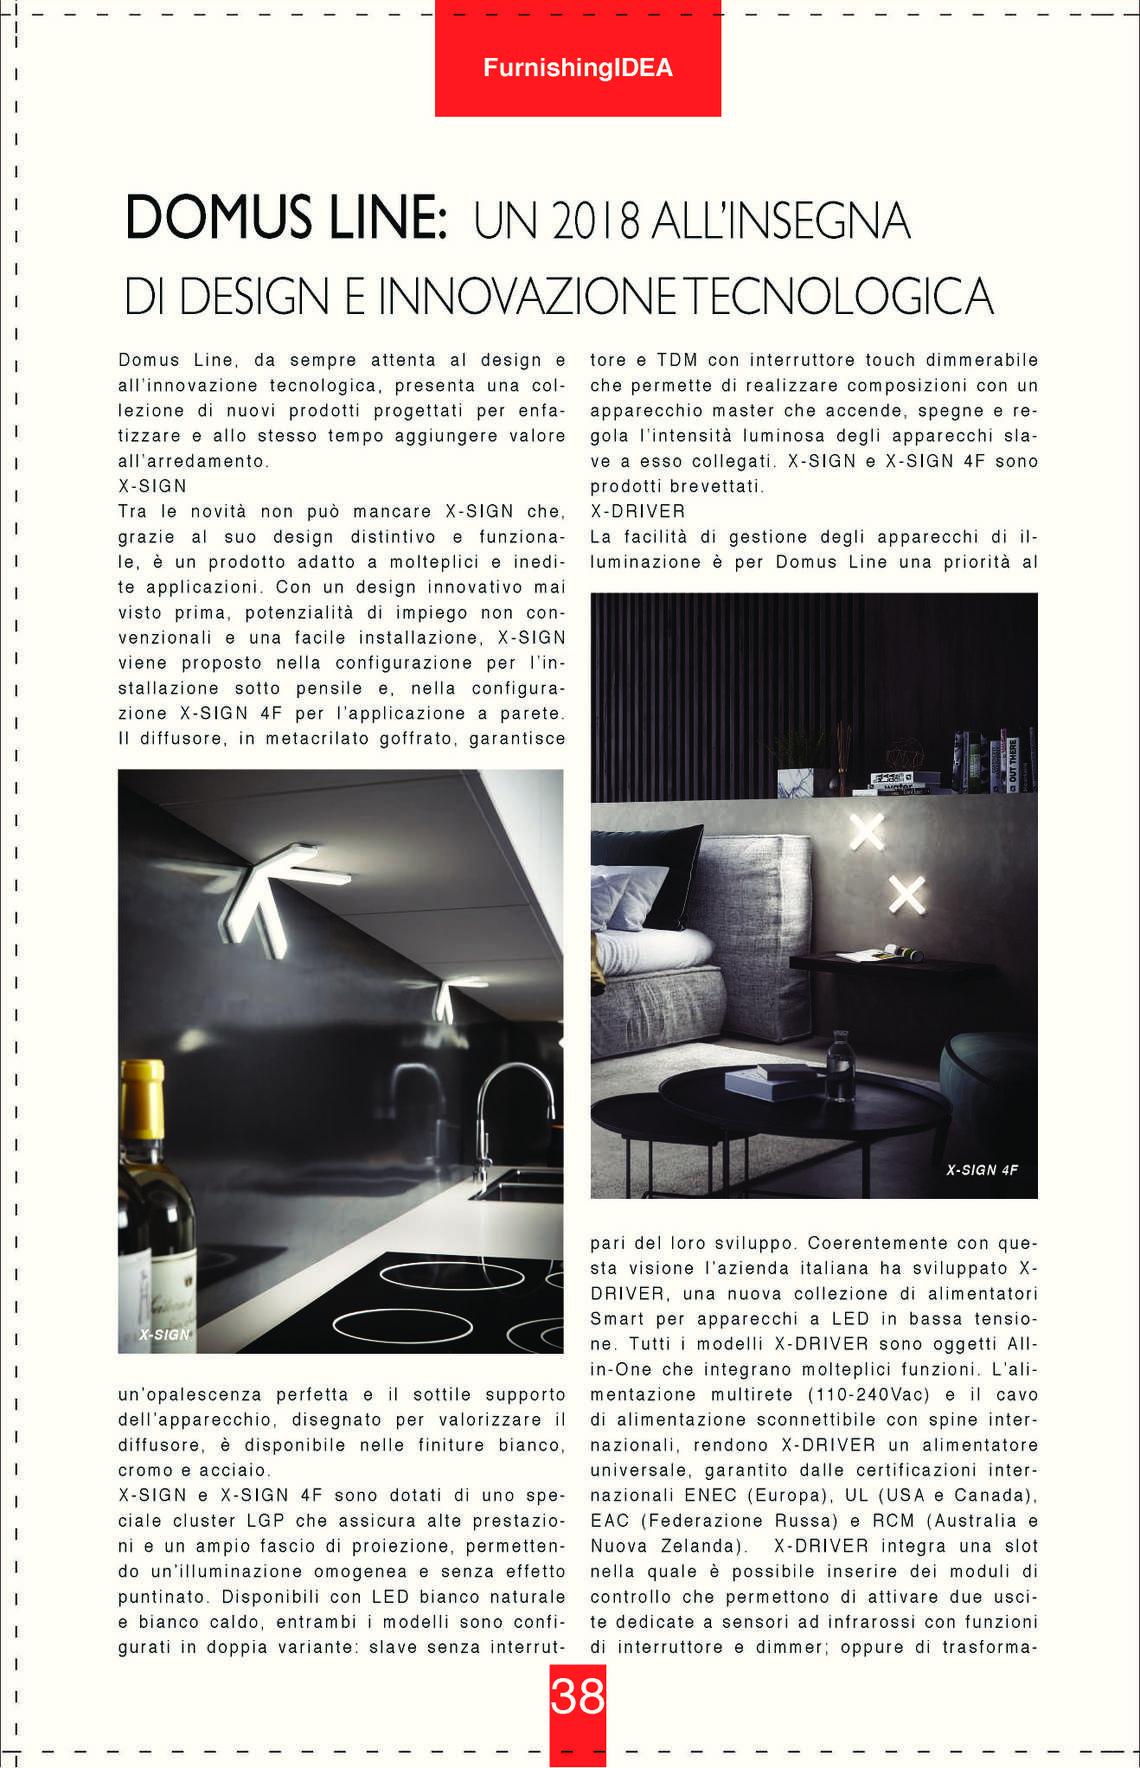 furnishing-idea-journal--1-2018_journal_9_037.jpg